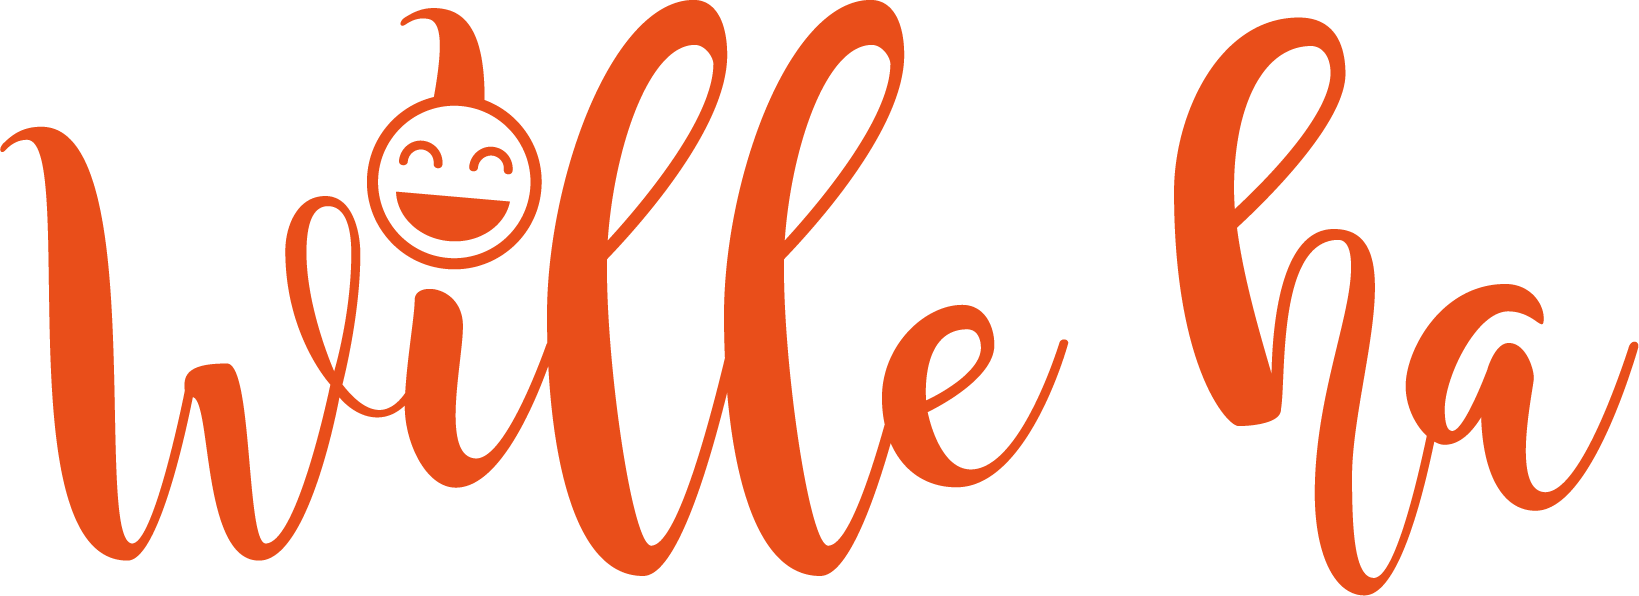 Wille ha - Hét adres voor kledingverhuur in Friesland!